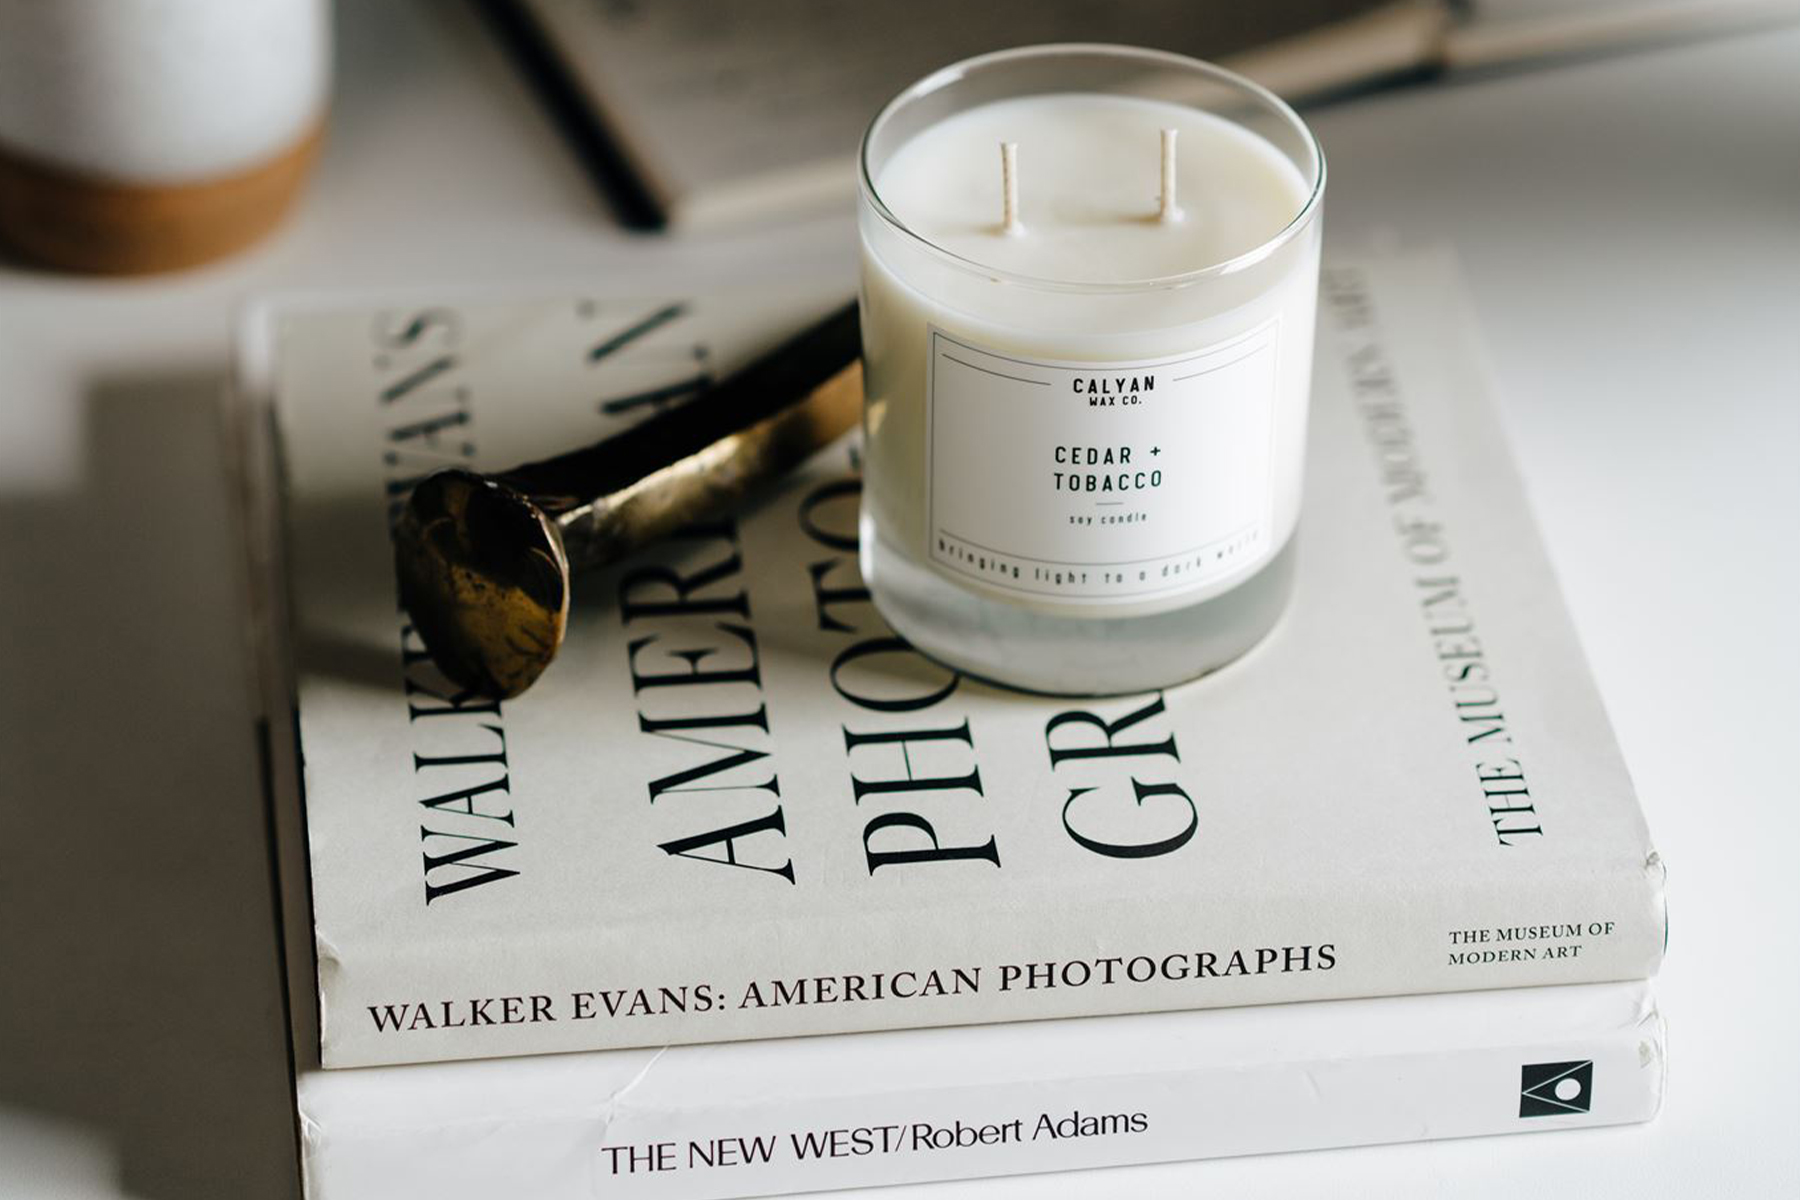 Calyan Wax Co. candle